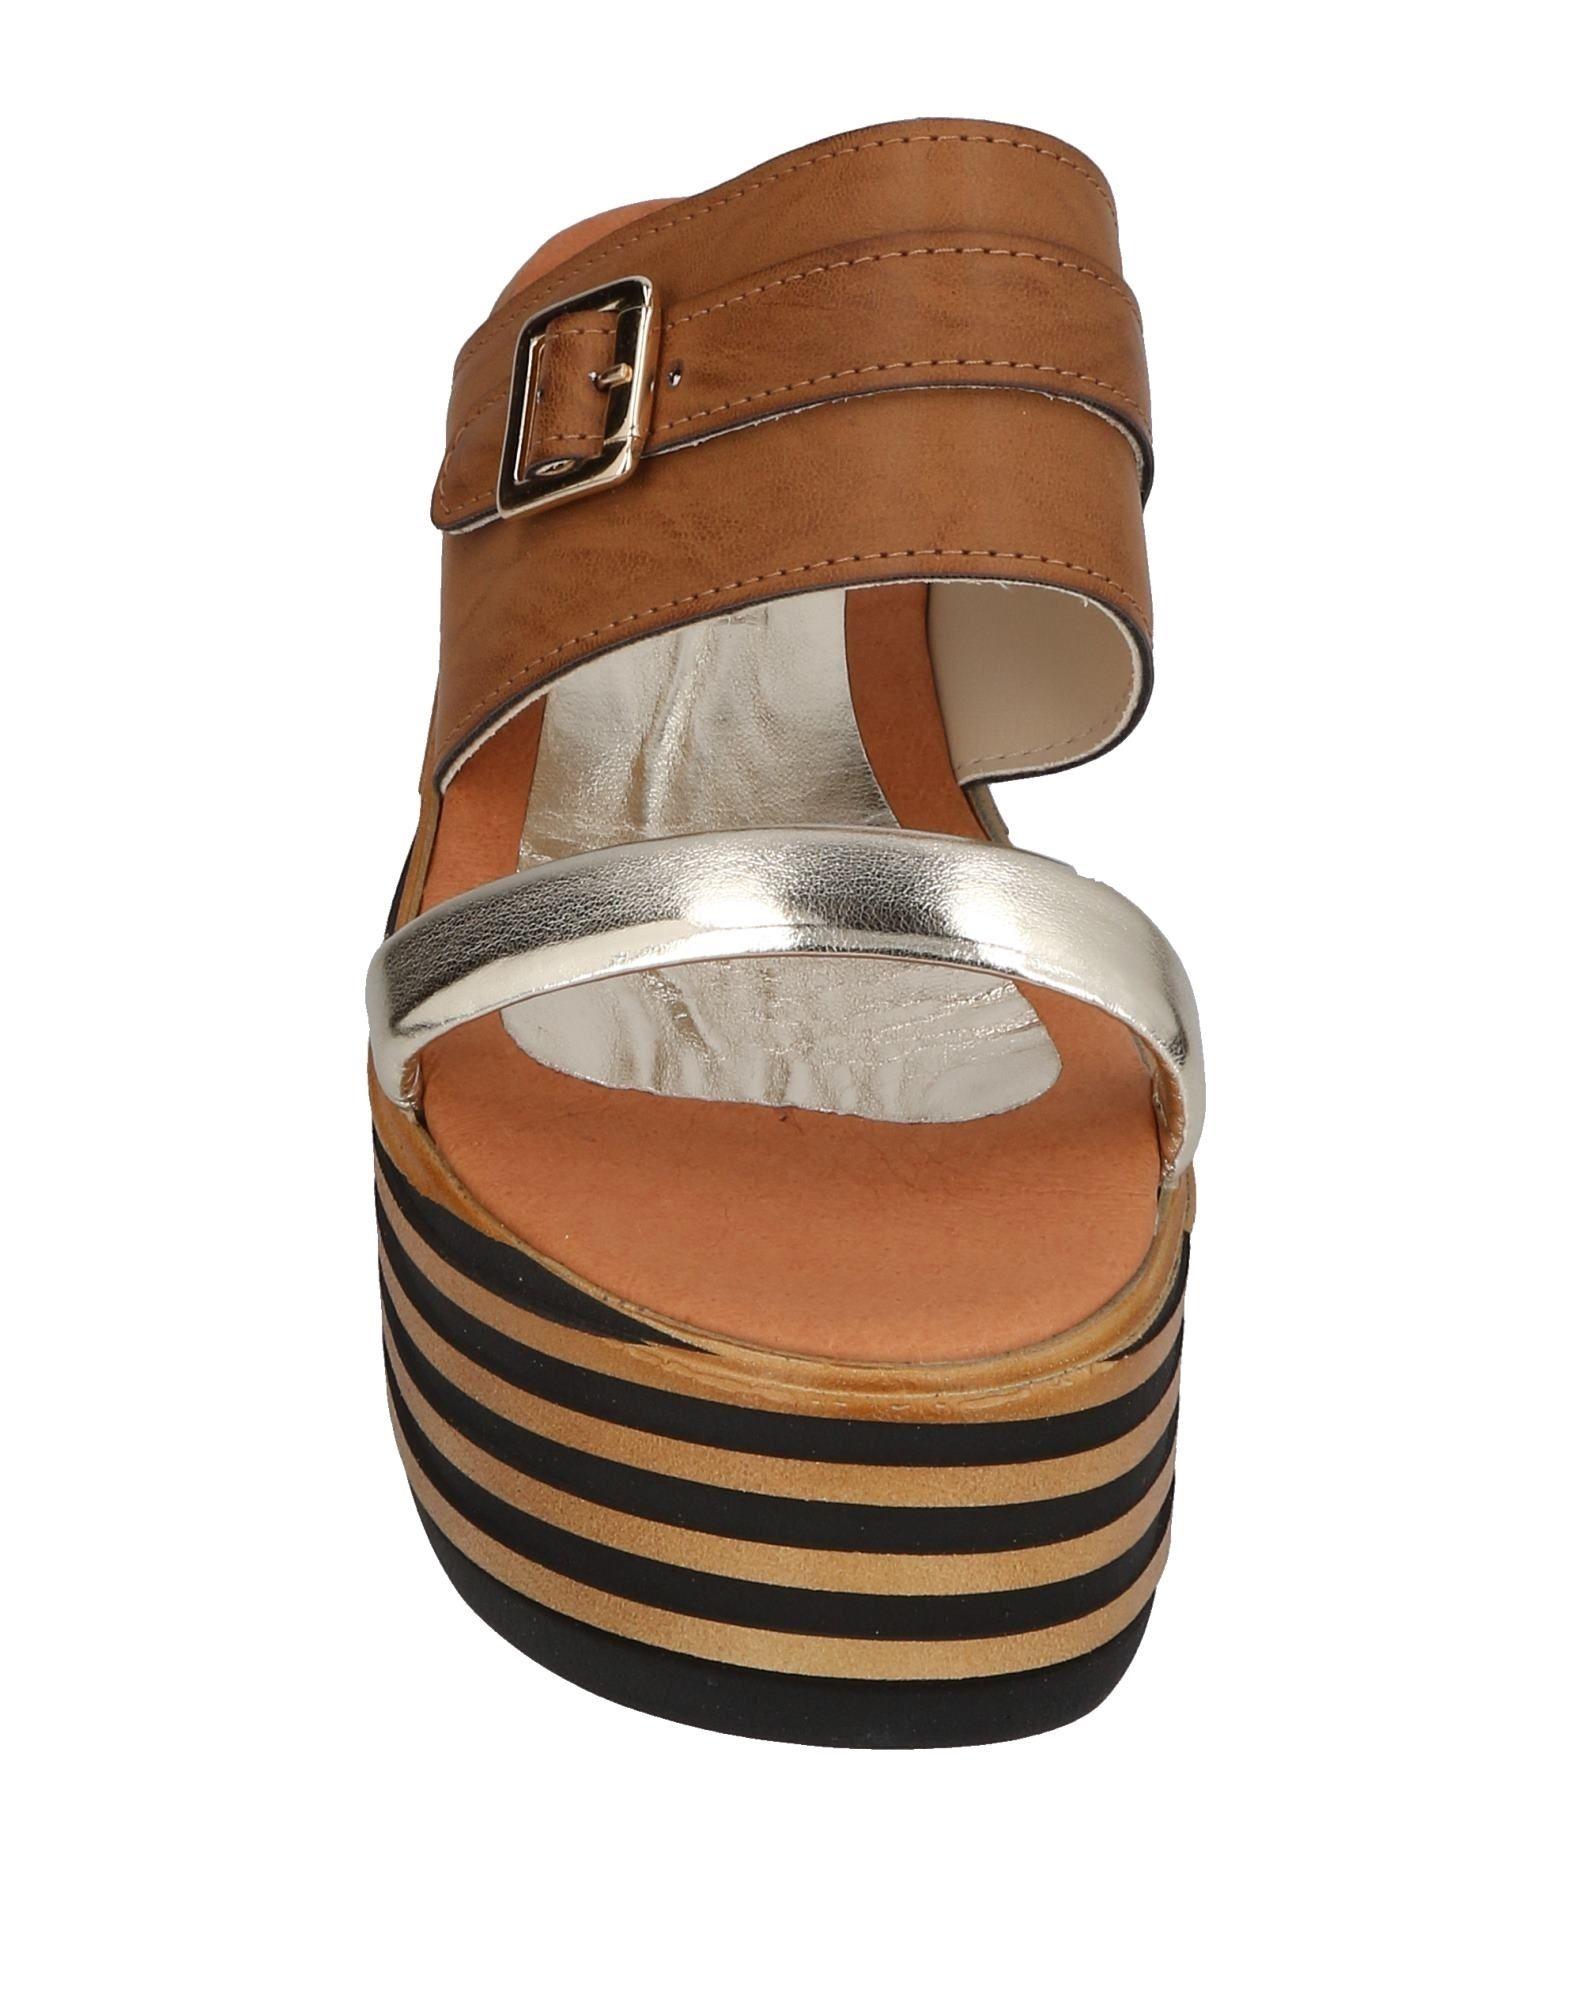 Sara Sandalen Damen  11460469NH Gute Qualität beliebte Schuhe Schuhe Schuhe af90c0